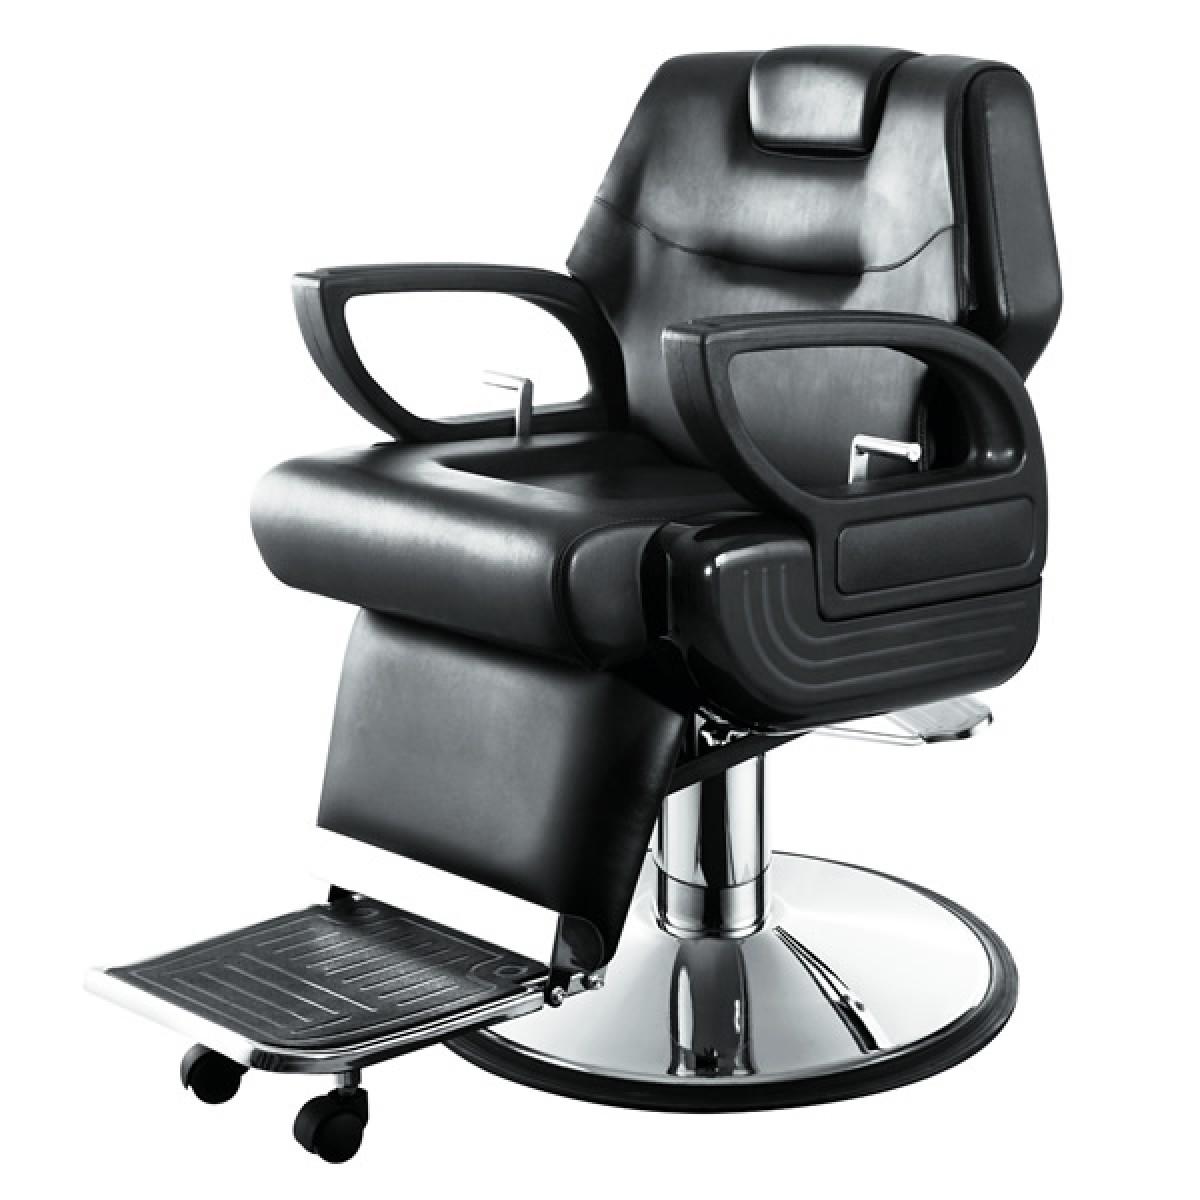 CAESAR  Barber Chair with Heavy Duty Hydraulic Pump  sc 1 st  AGS BEAUTY & CAESAR